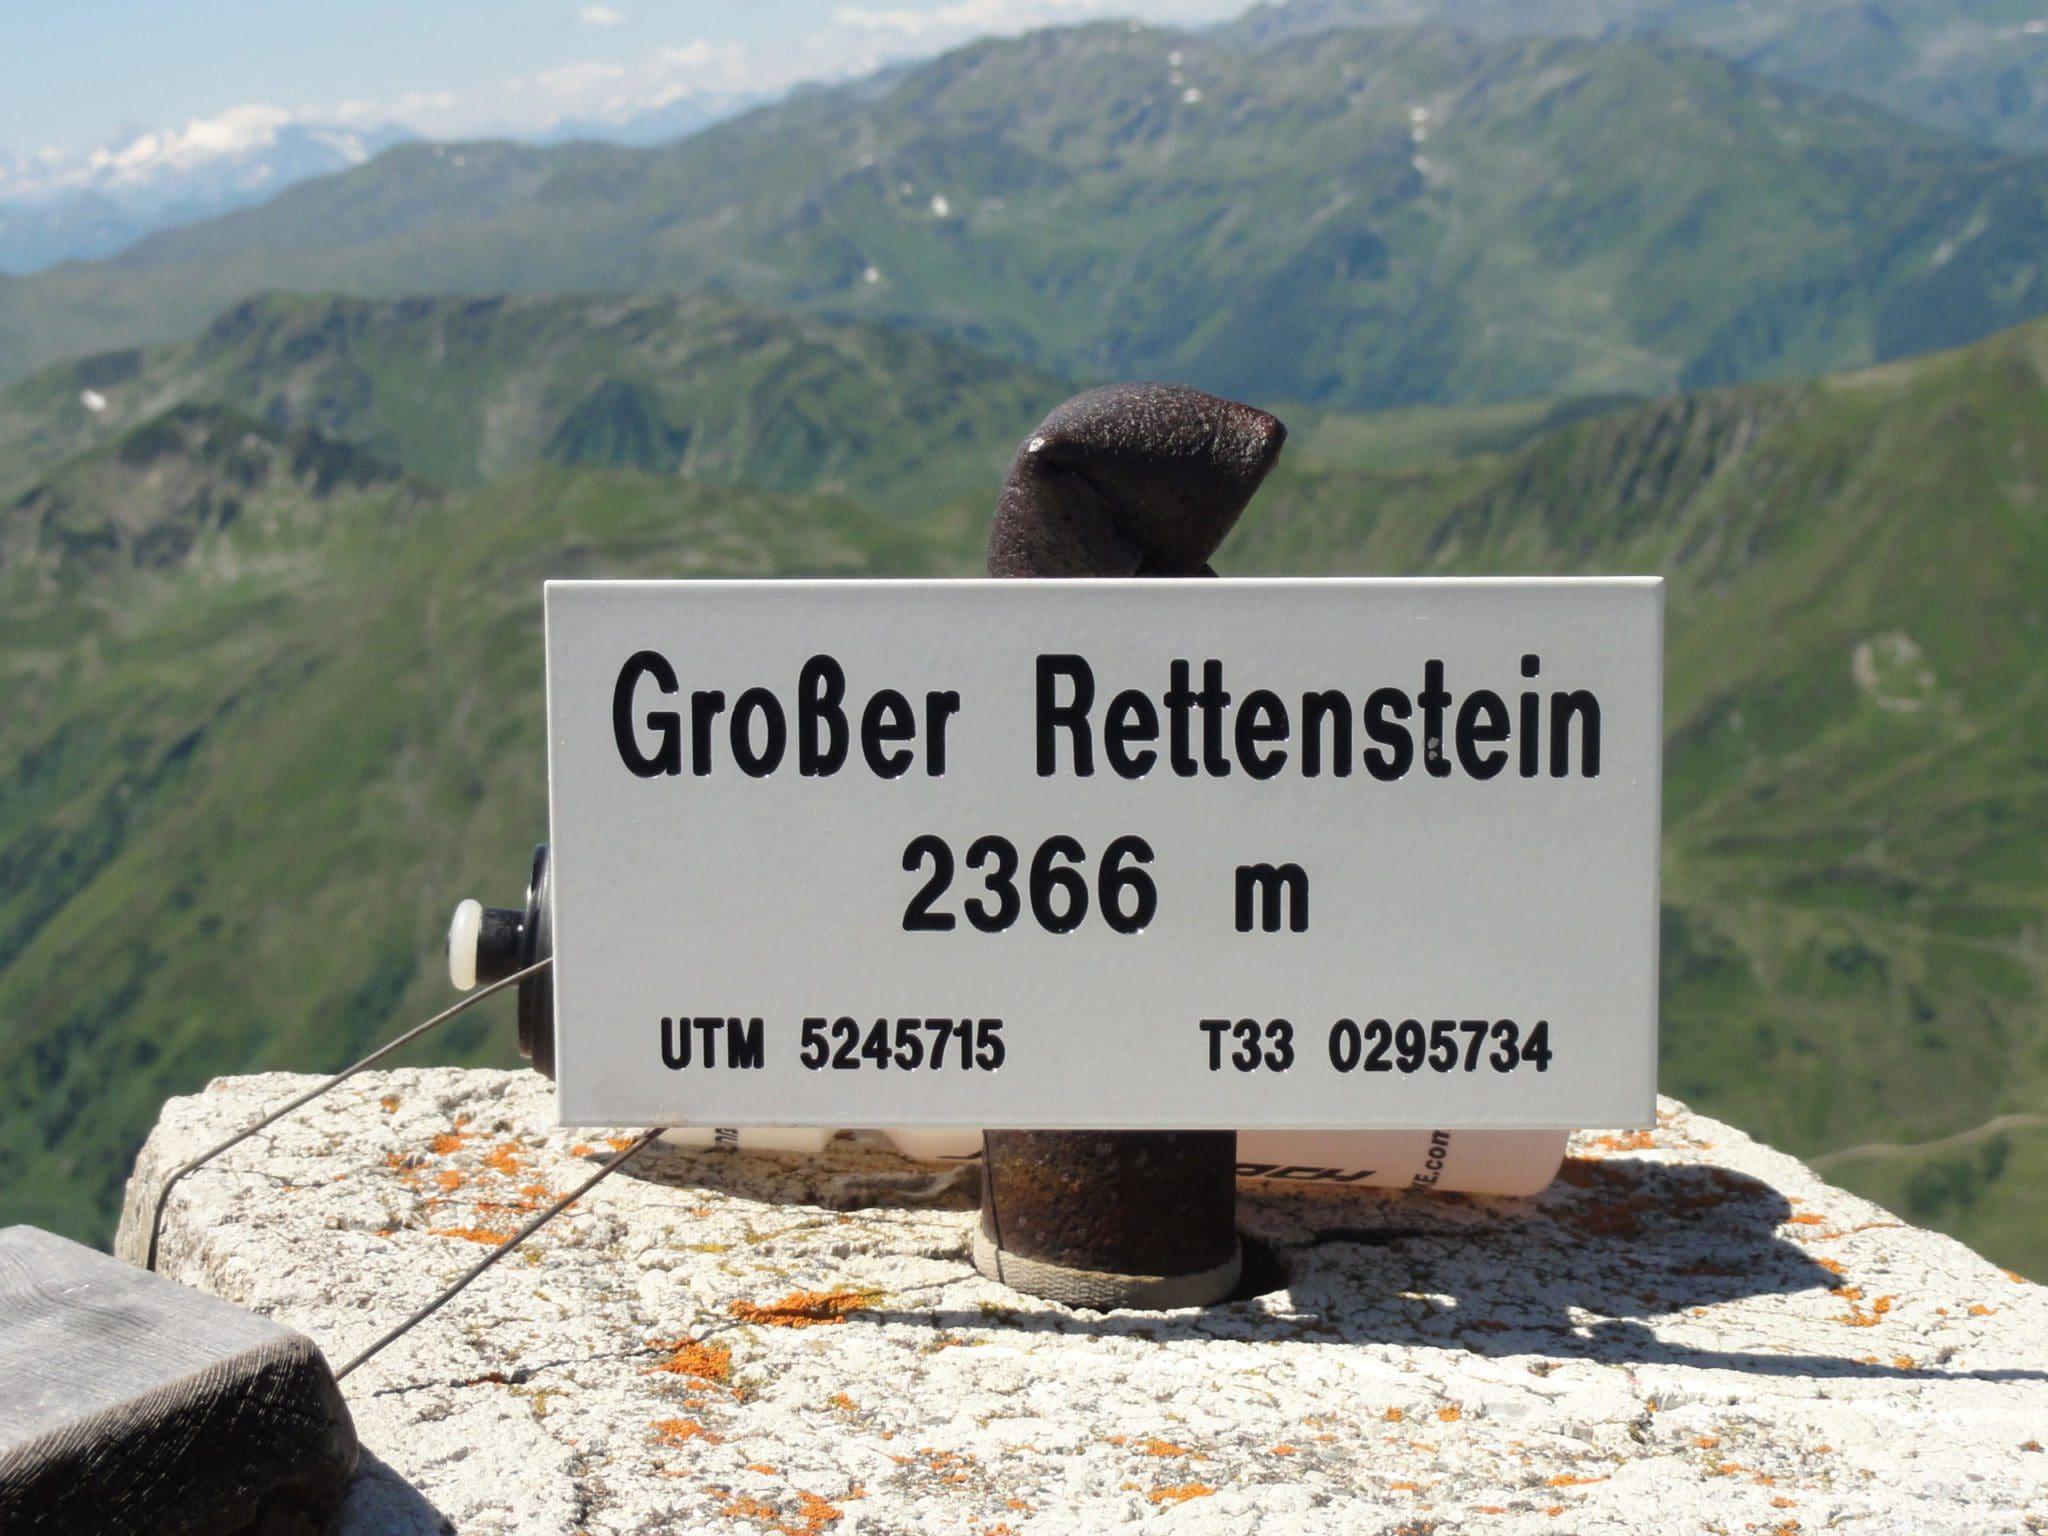 Grosser-Rettenstein_9